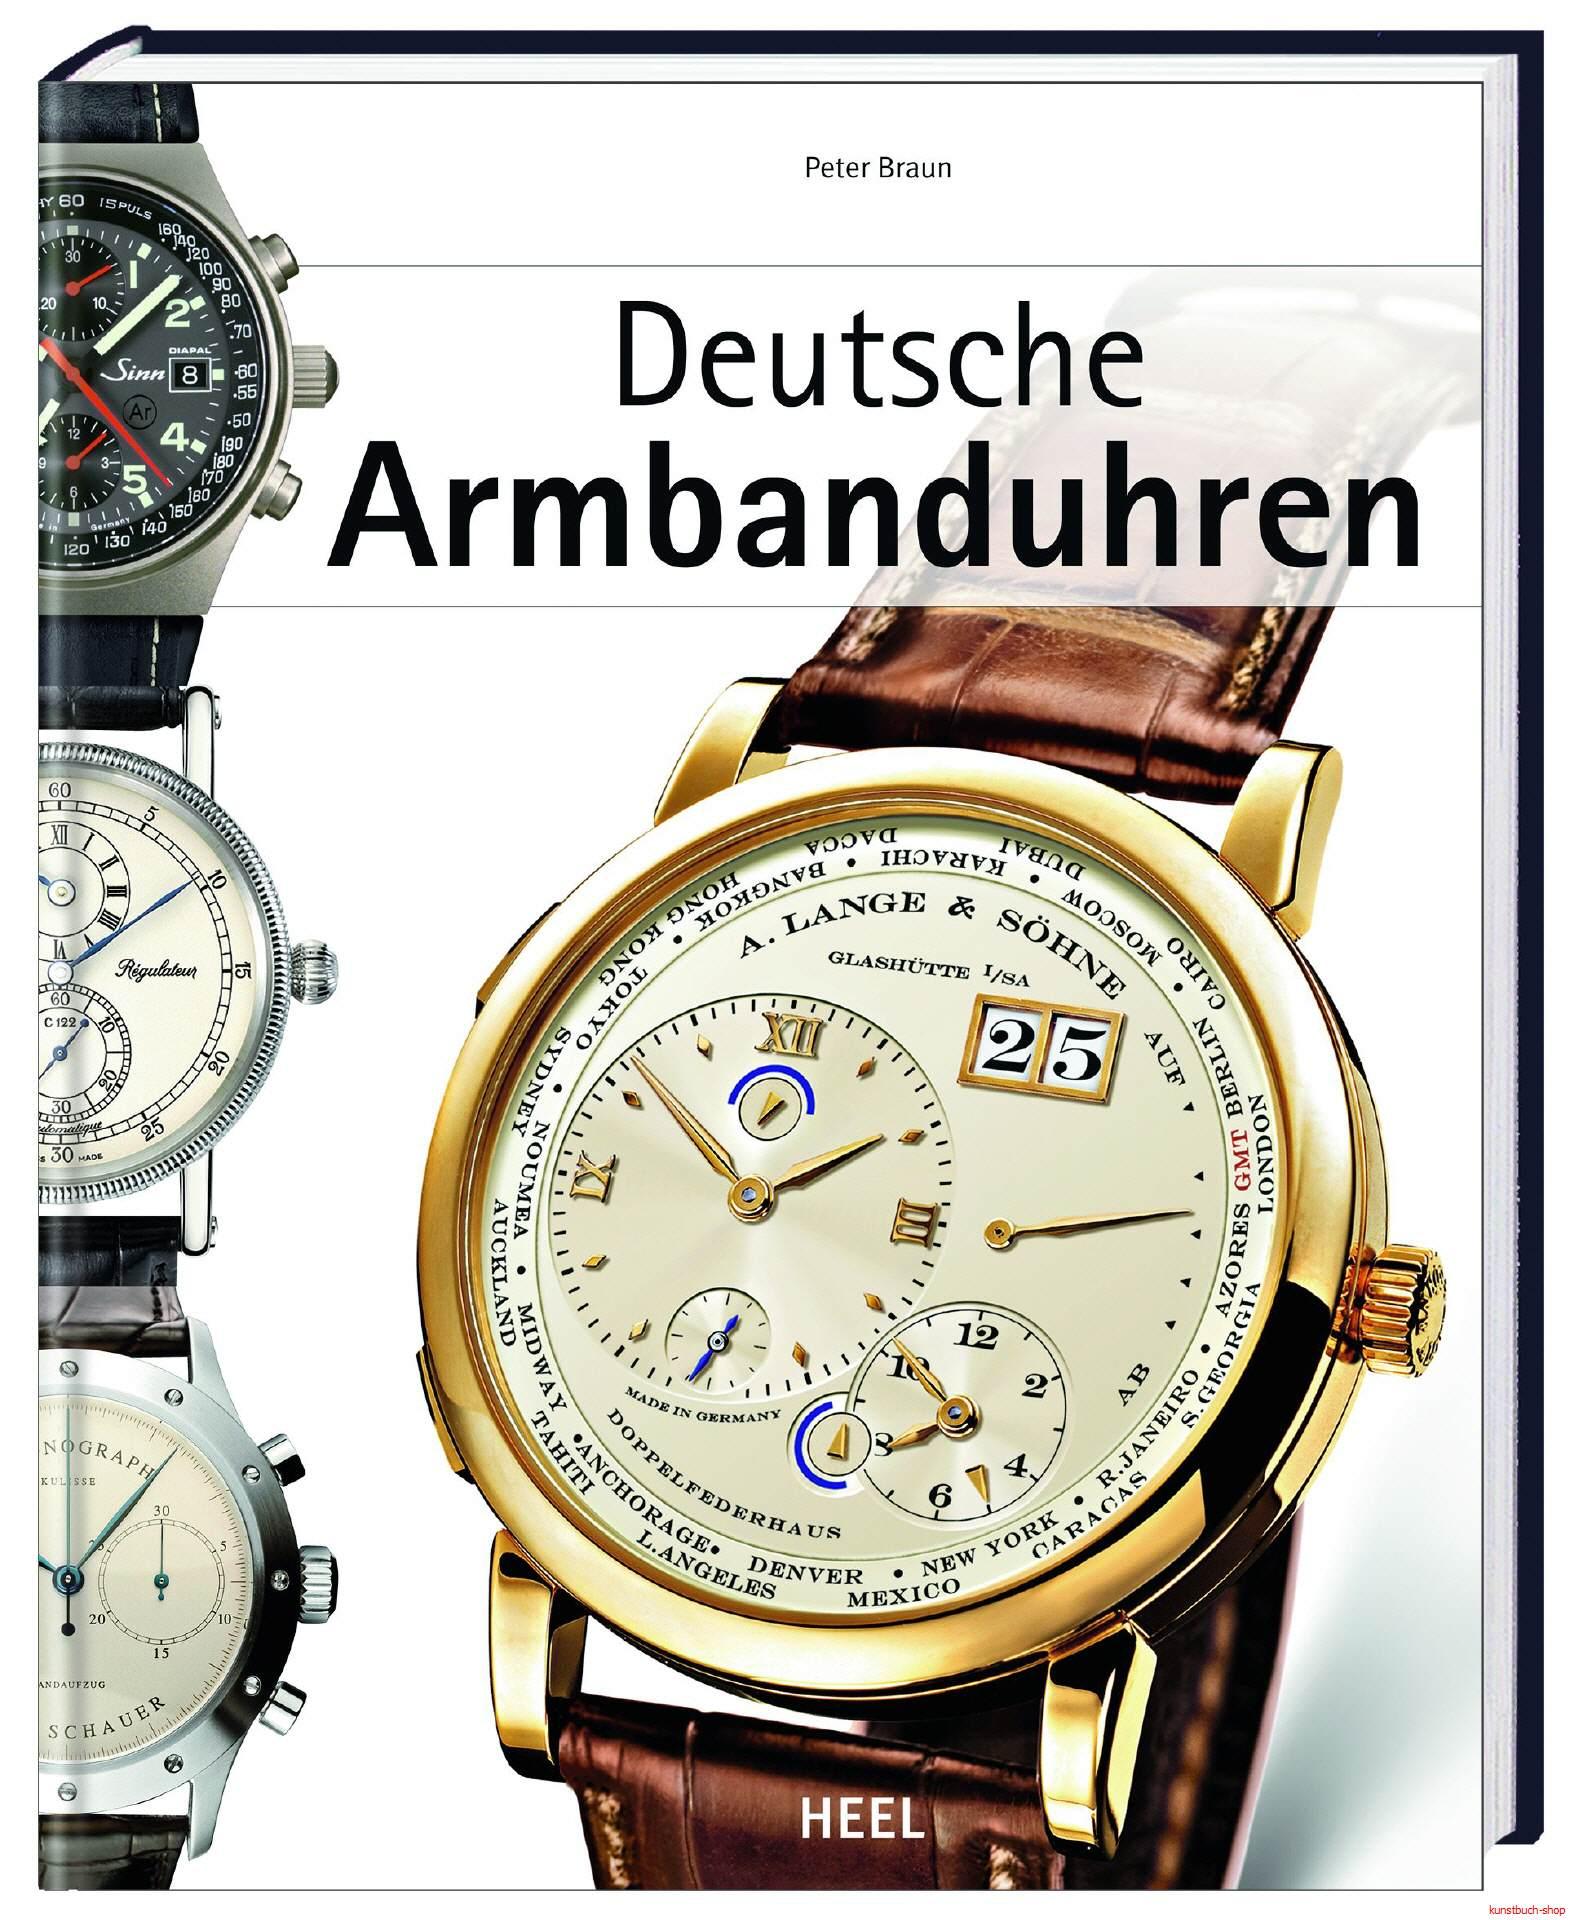 Deutsche Armbanduhren - Peter Braun